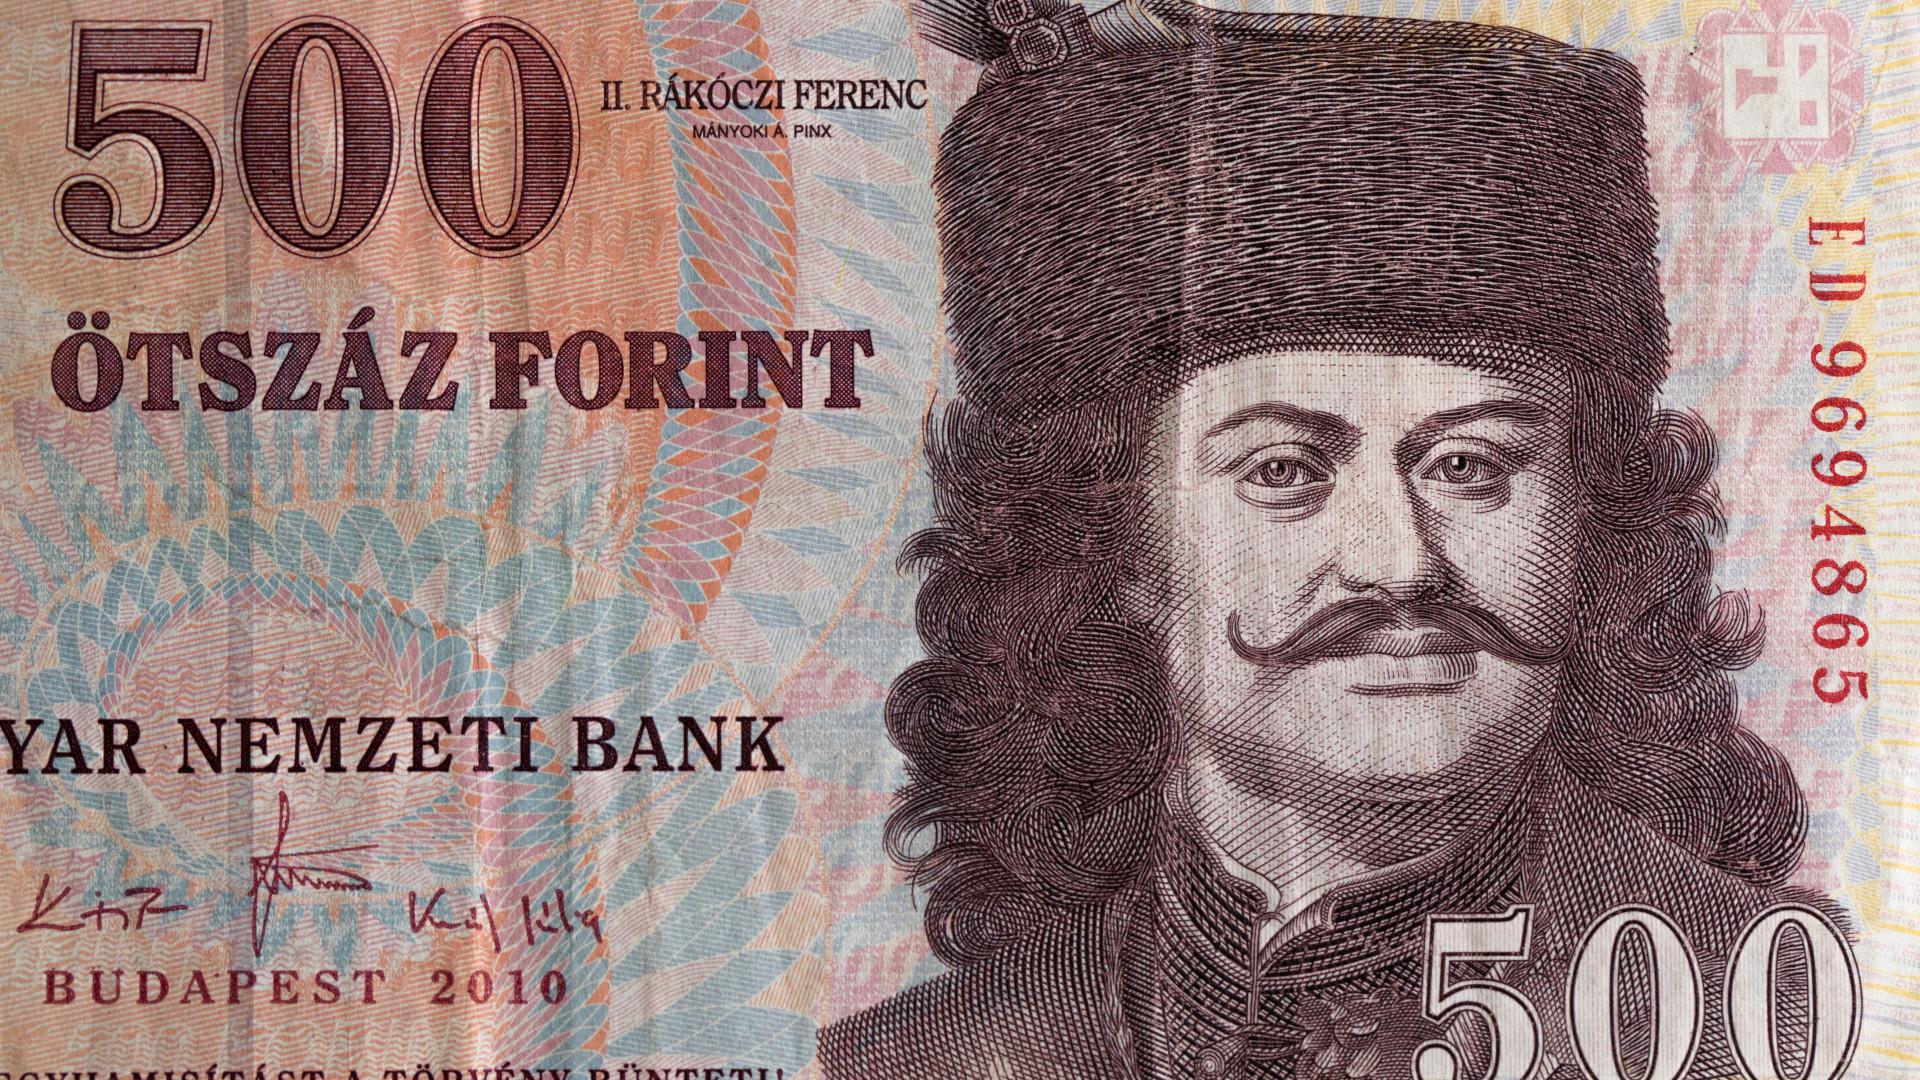 500 forintos bankjegy